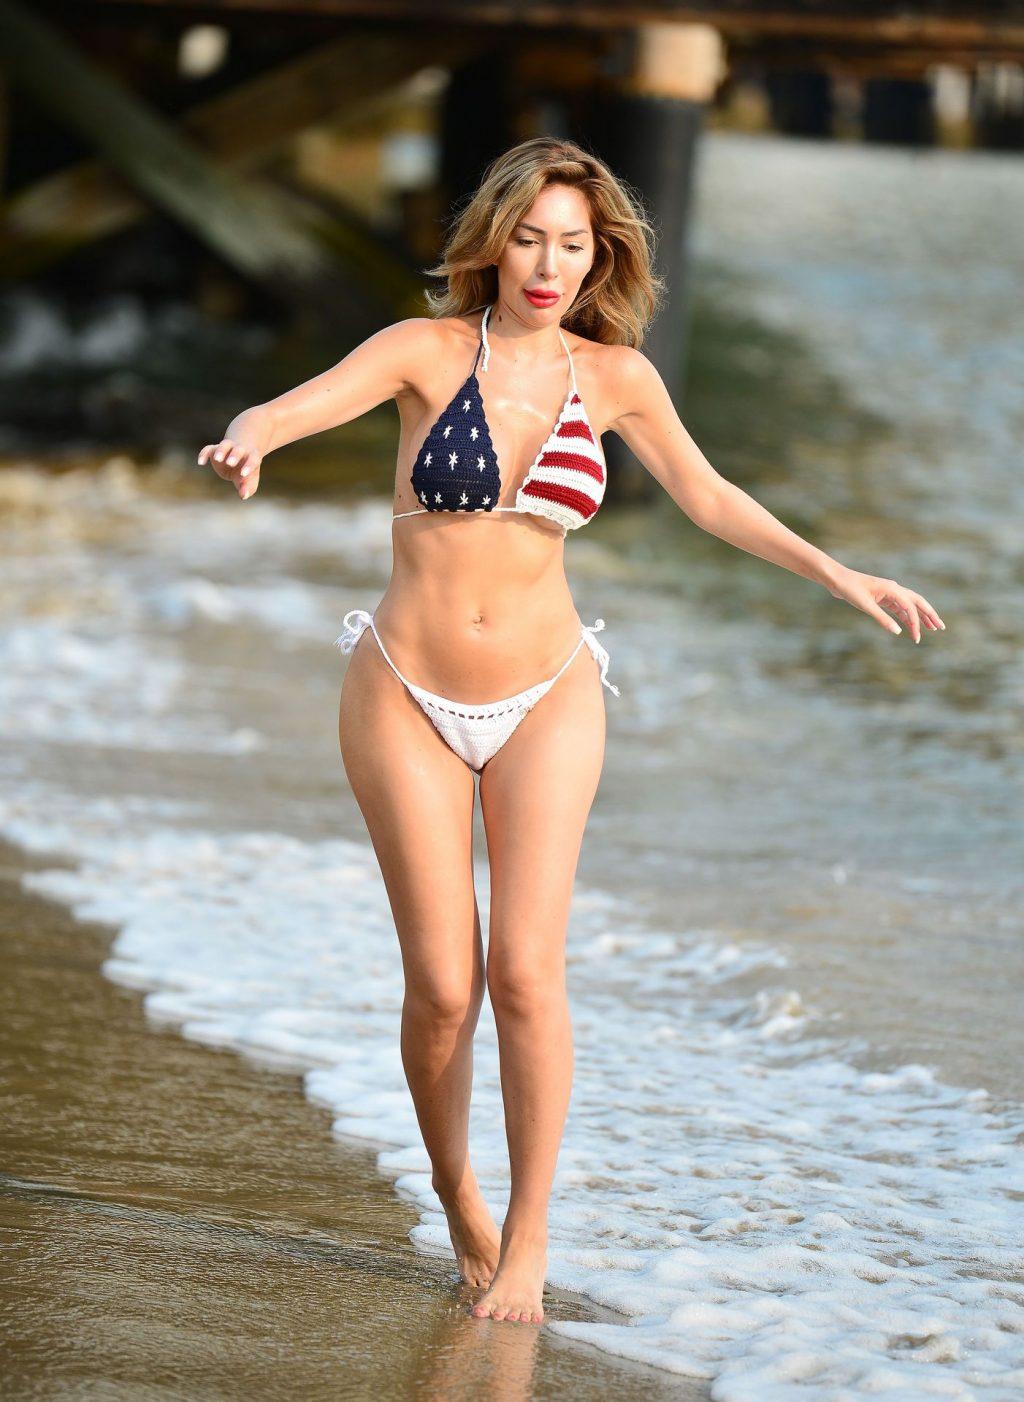 Farrah Abraham Shows Off Her Amazing Body in a Skimpy Patriotic Bikini (45 Photos)